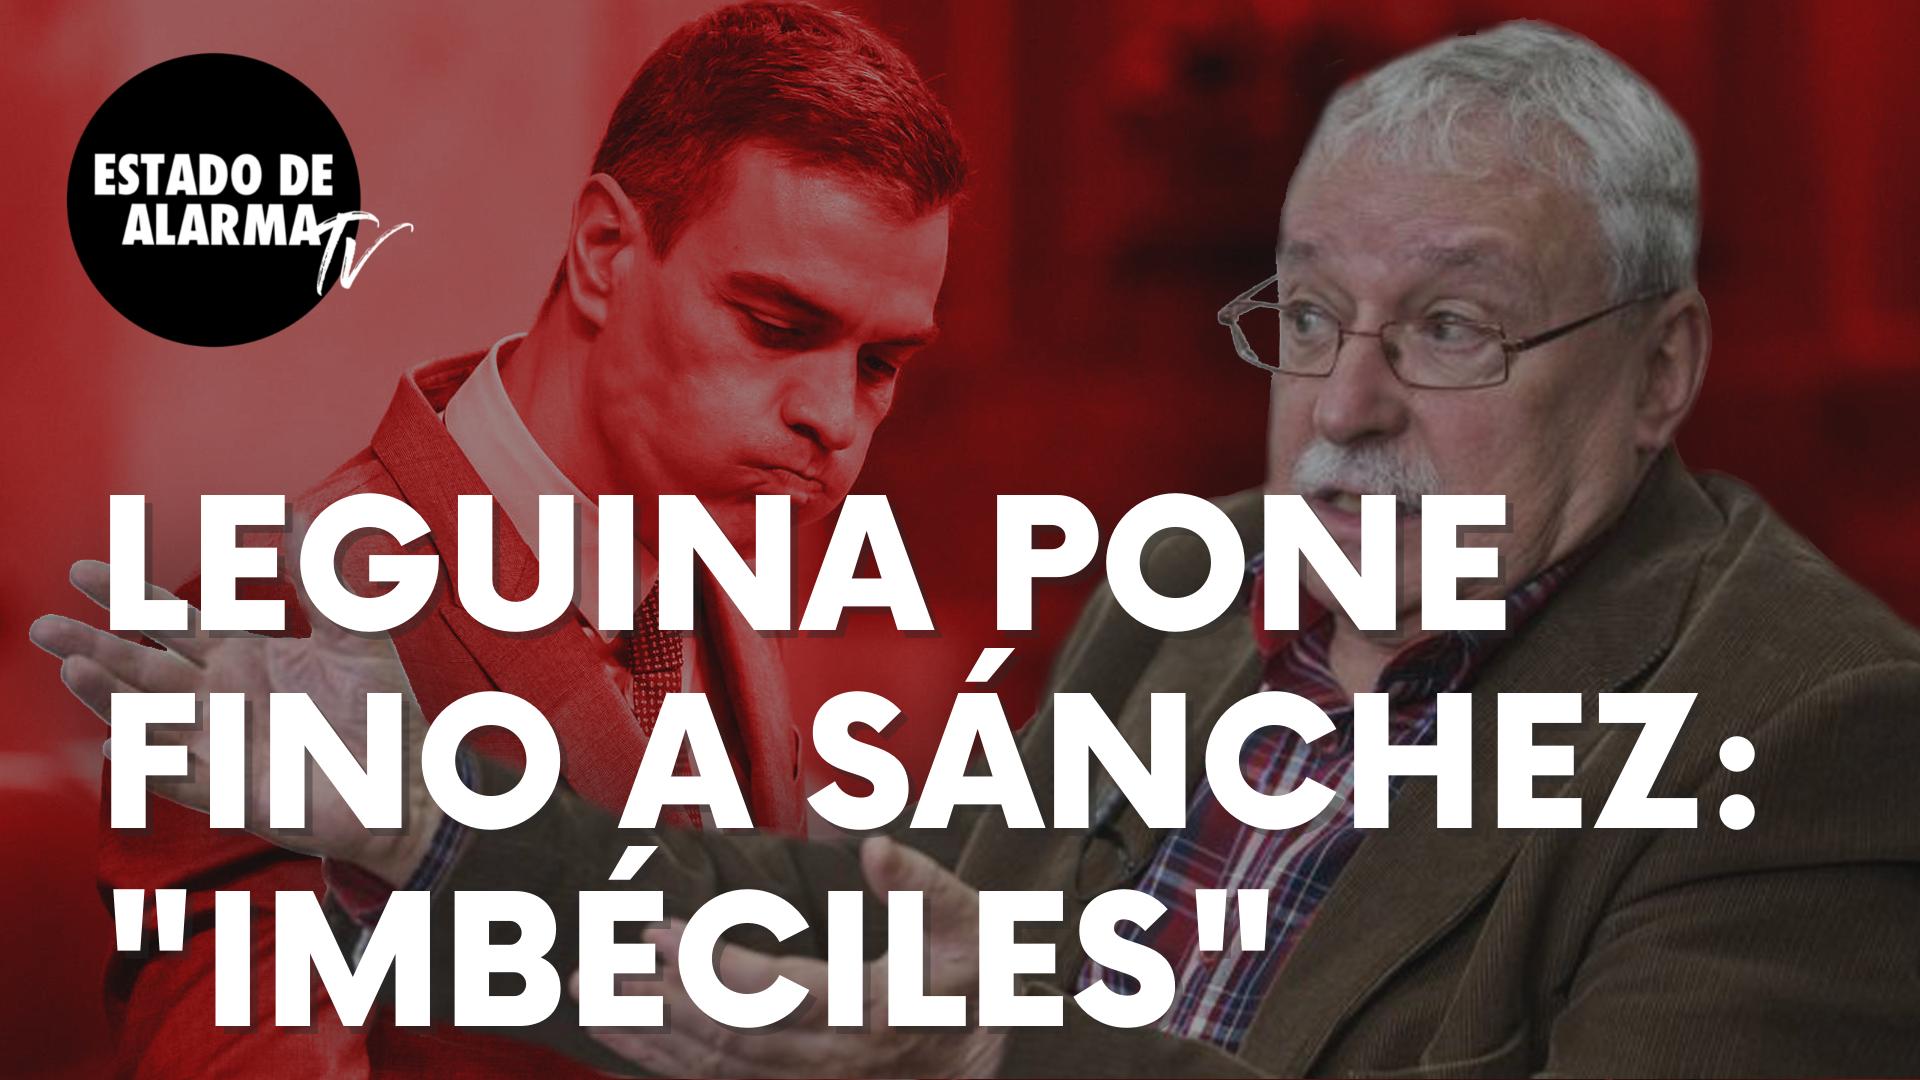 "Joaquín Leguina pone 'fino' a Sánchez por querer echarlo del PSOE tras su apoyo a Ayuso: ""Imbéciles"""